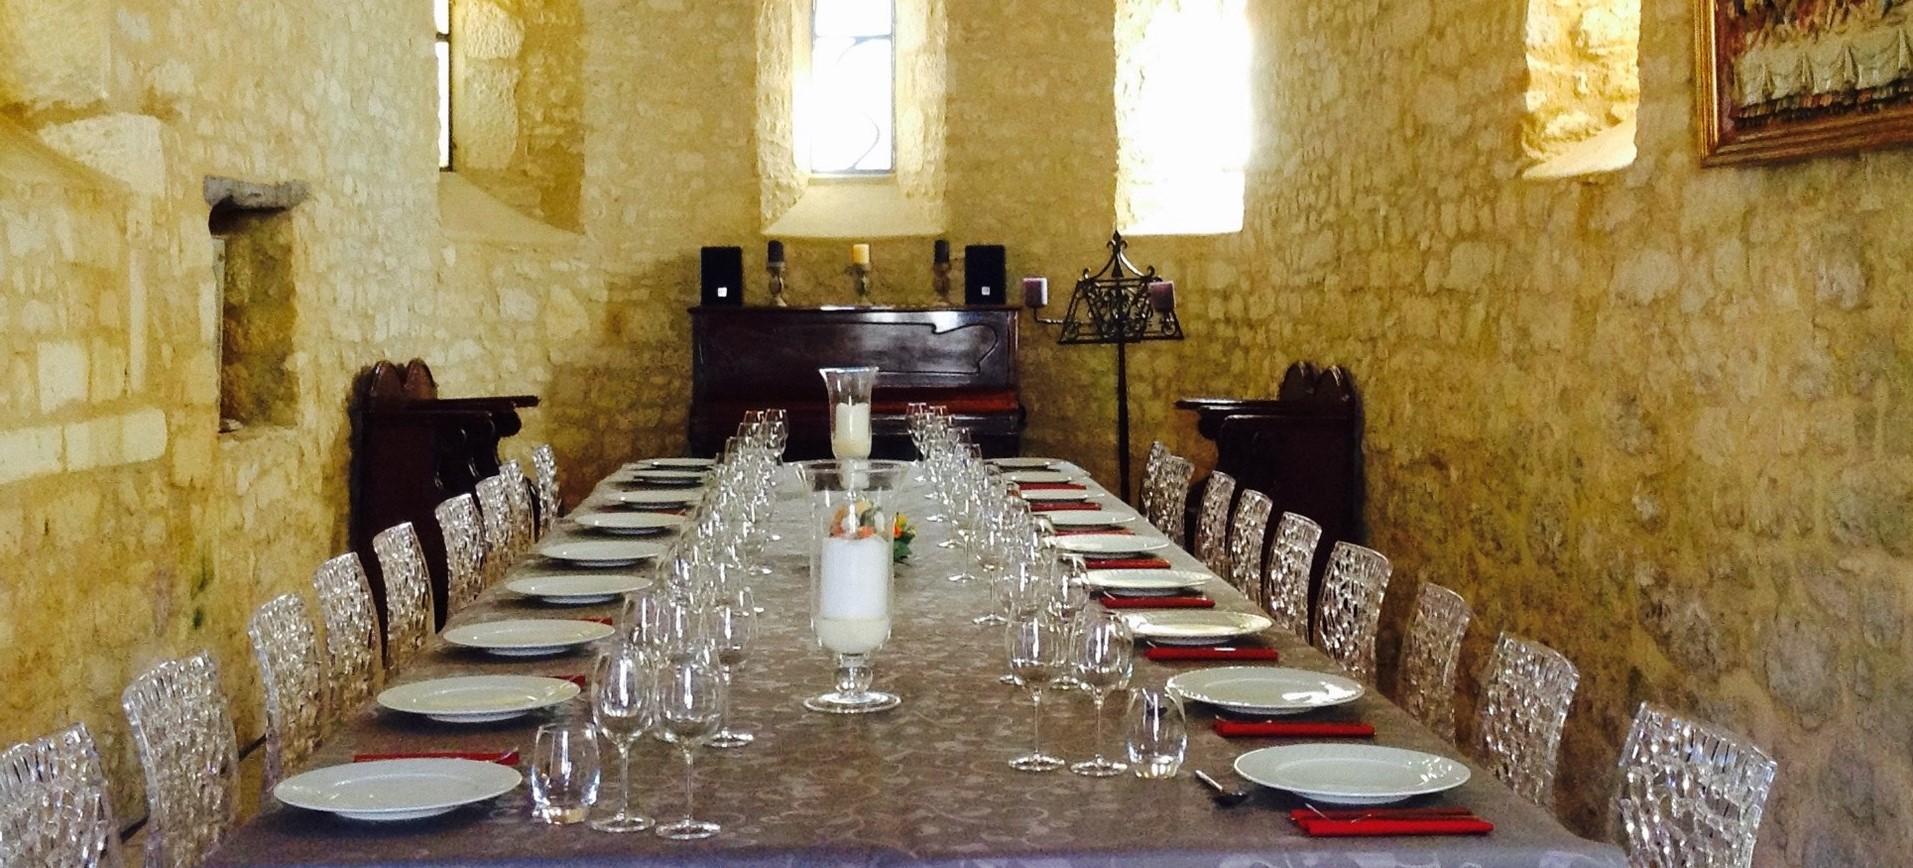 villa-le-village-dining-room-2